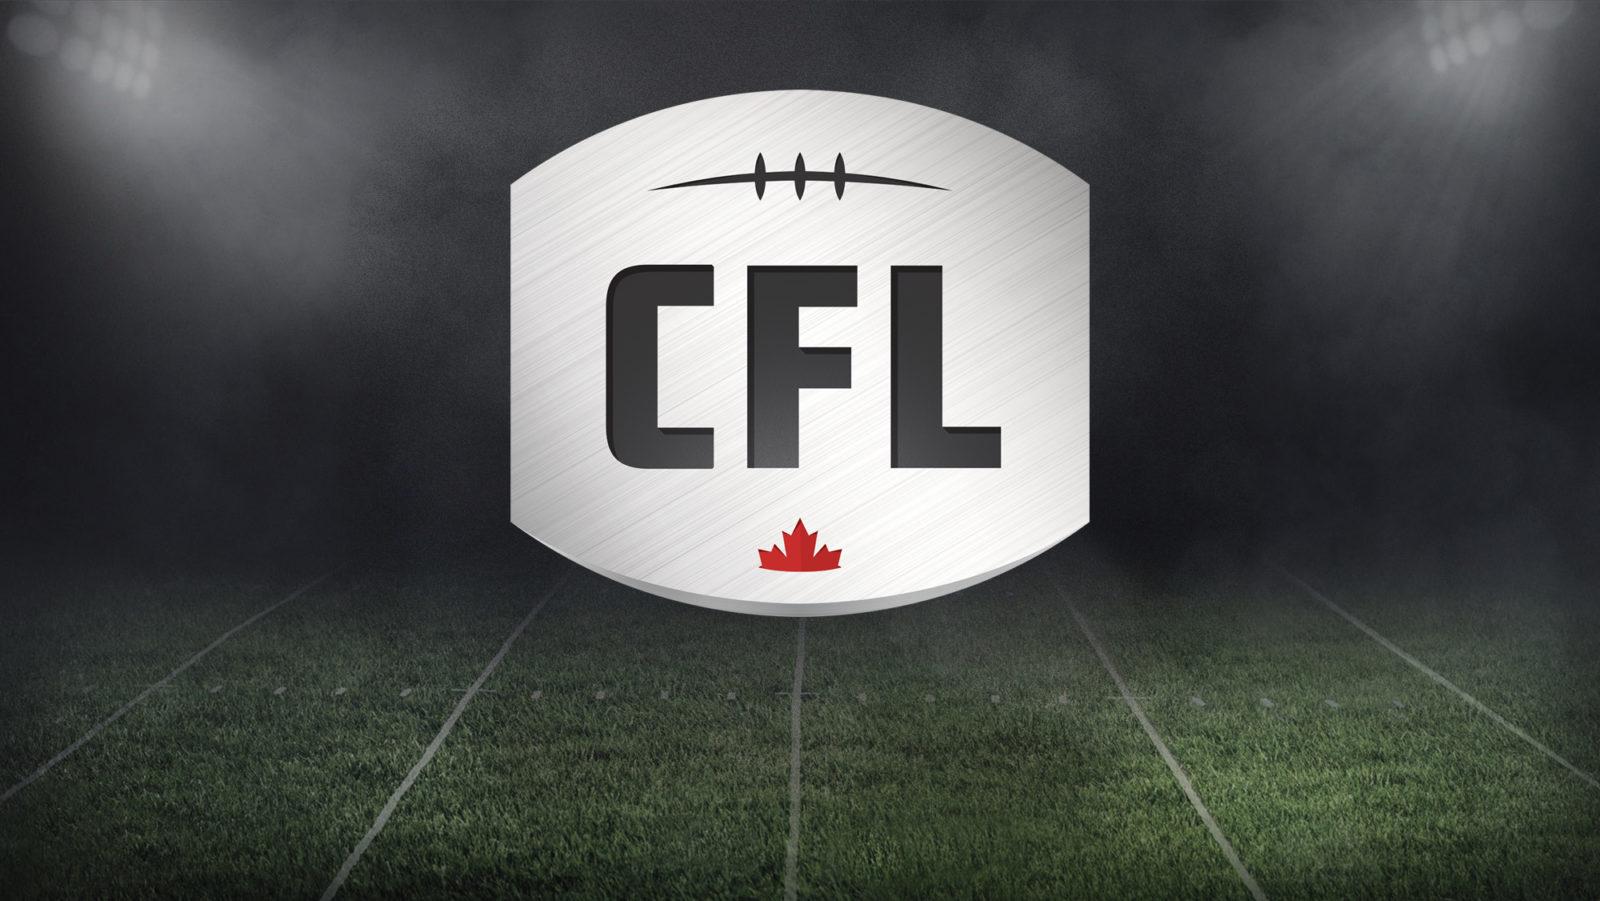 CFL will not play shortened season this fall - Toronto Argonauts